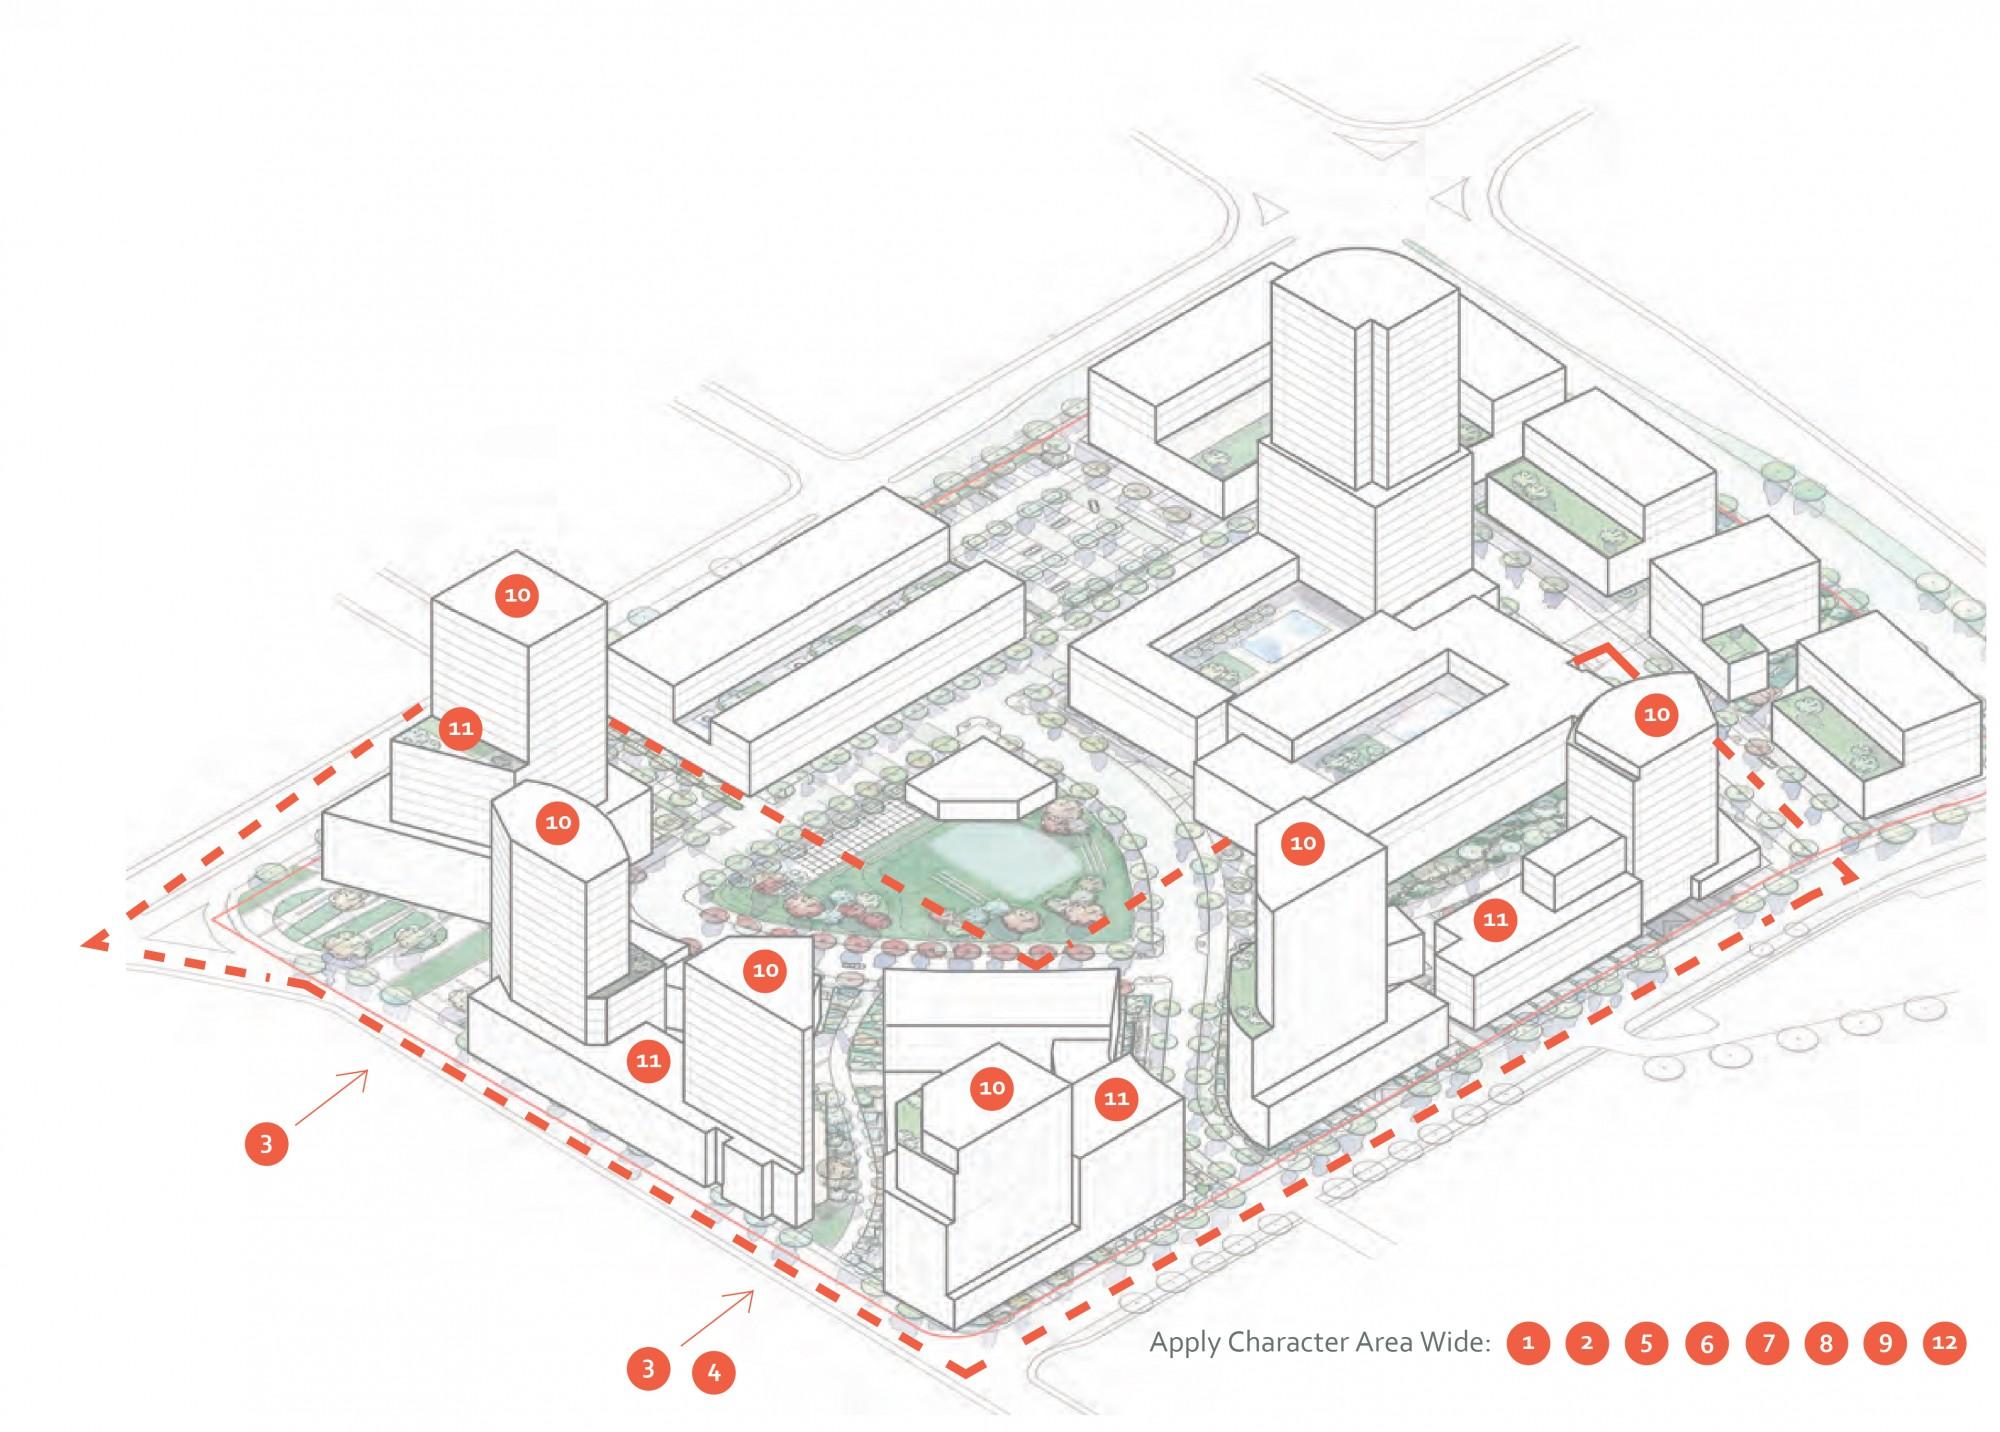 2040 OCP - Comprehensive Zone 26 - diagram of residential focus area in Capri Landmark zone